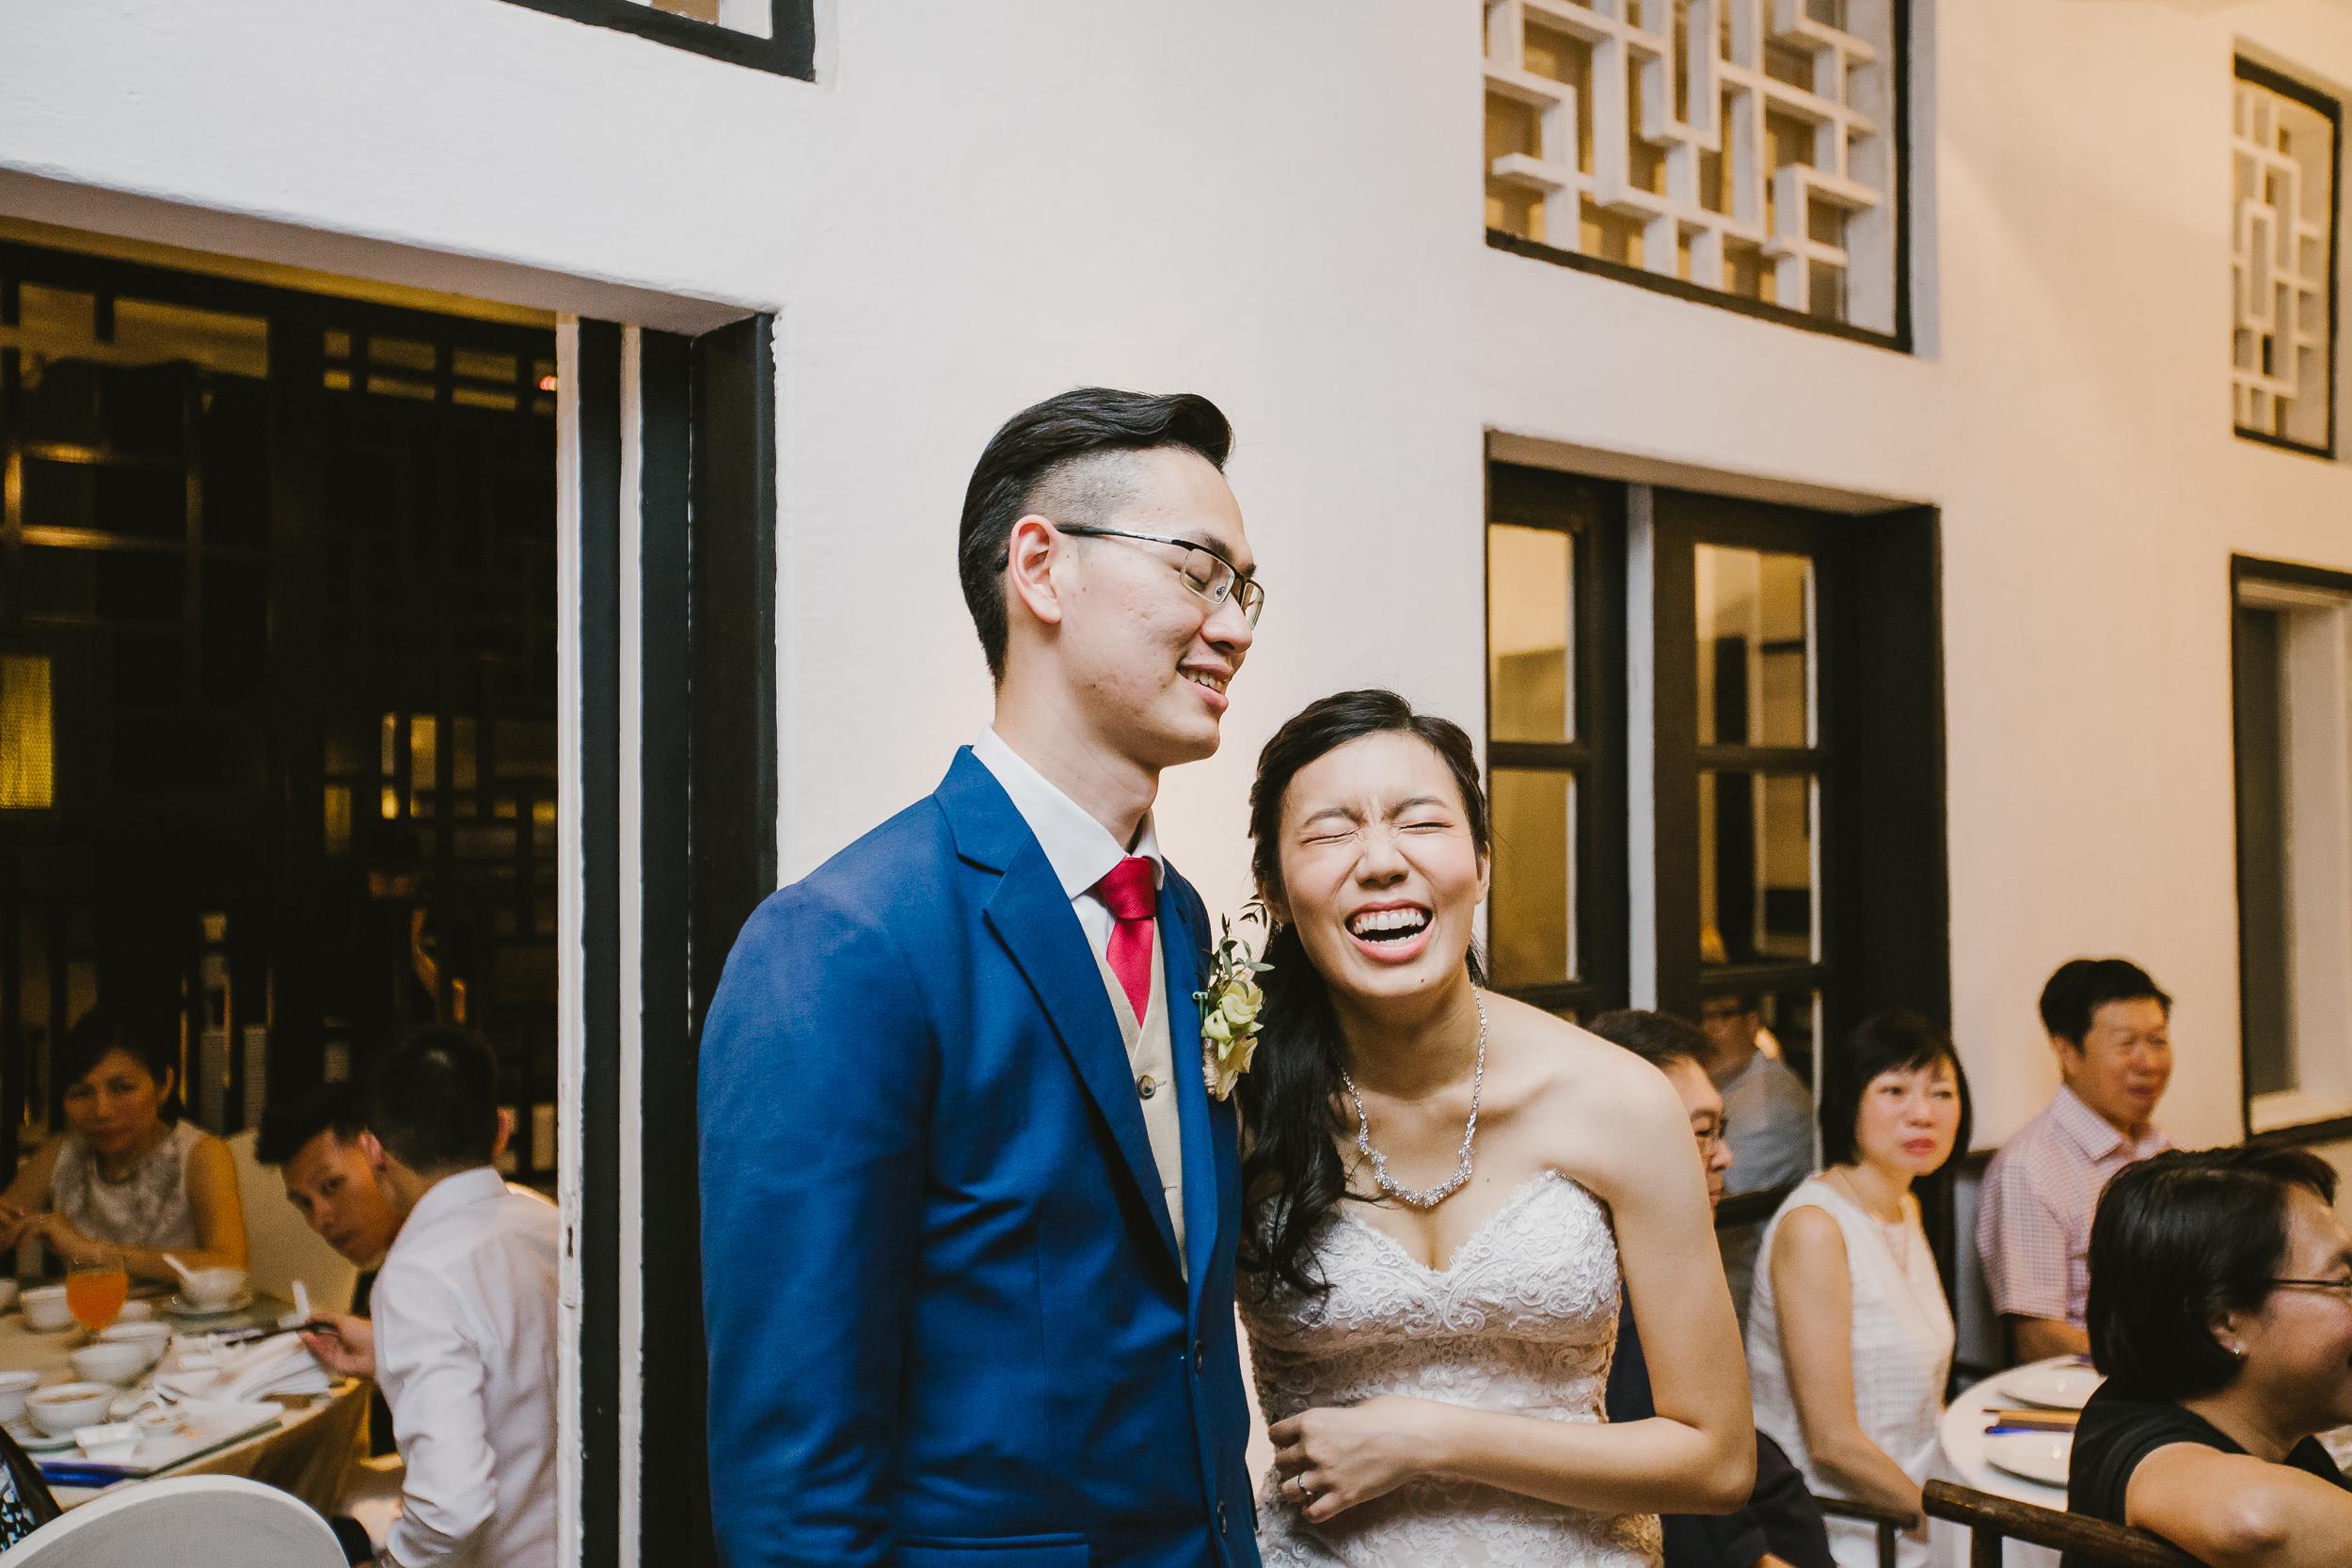 Singapore+Actual+Day+Wedding+Photographer+Min+Jiang+Rochester+Gareth+Faith--0070.jpg